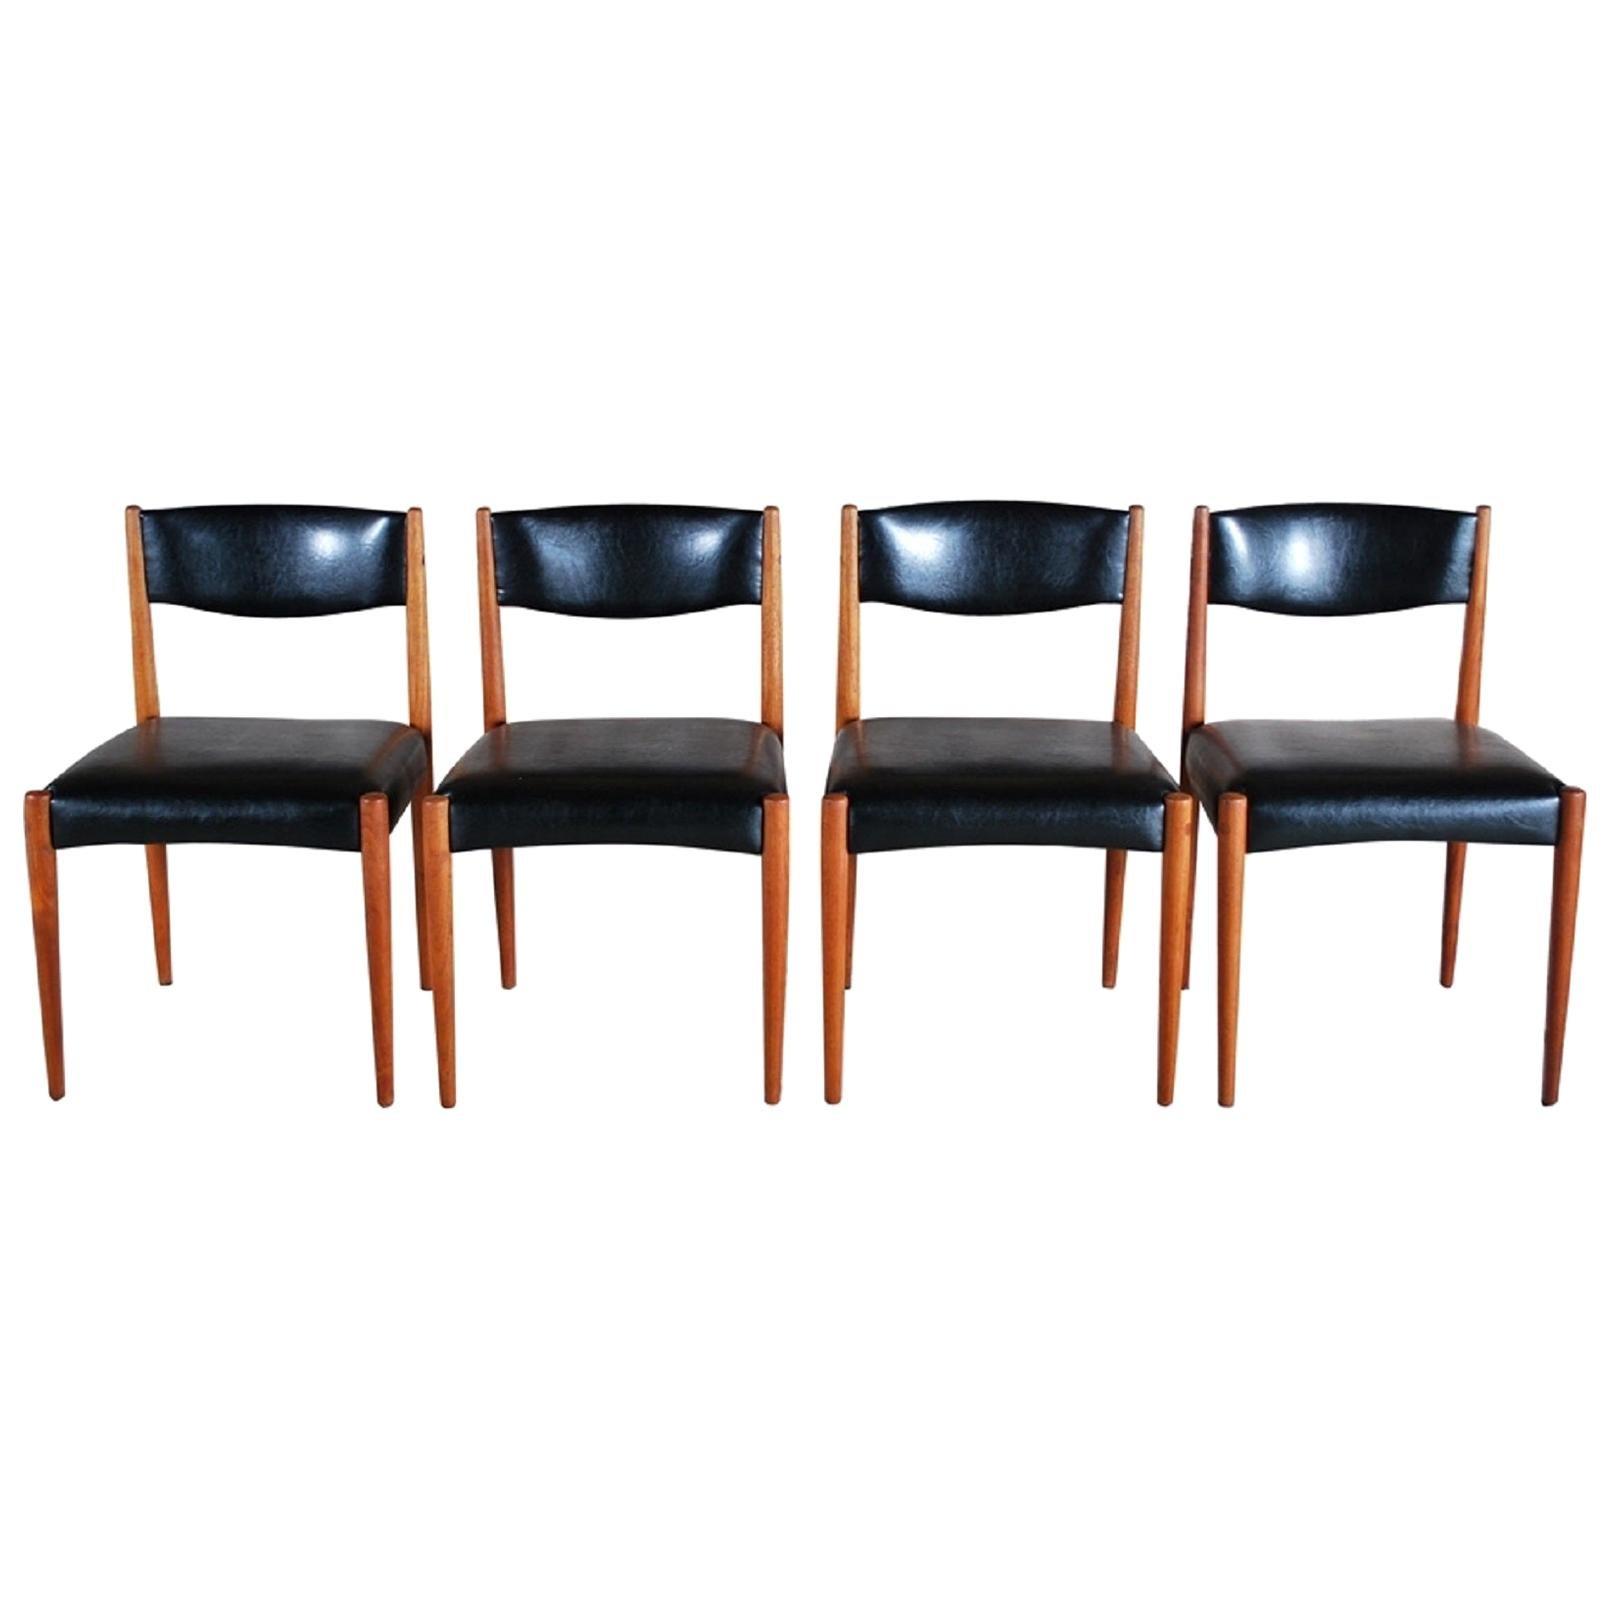 Set of 4 Dutch Mid-Century Teak Dining Chairs, 20th Century